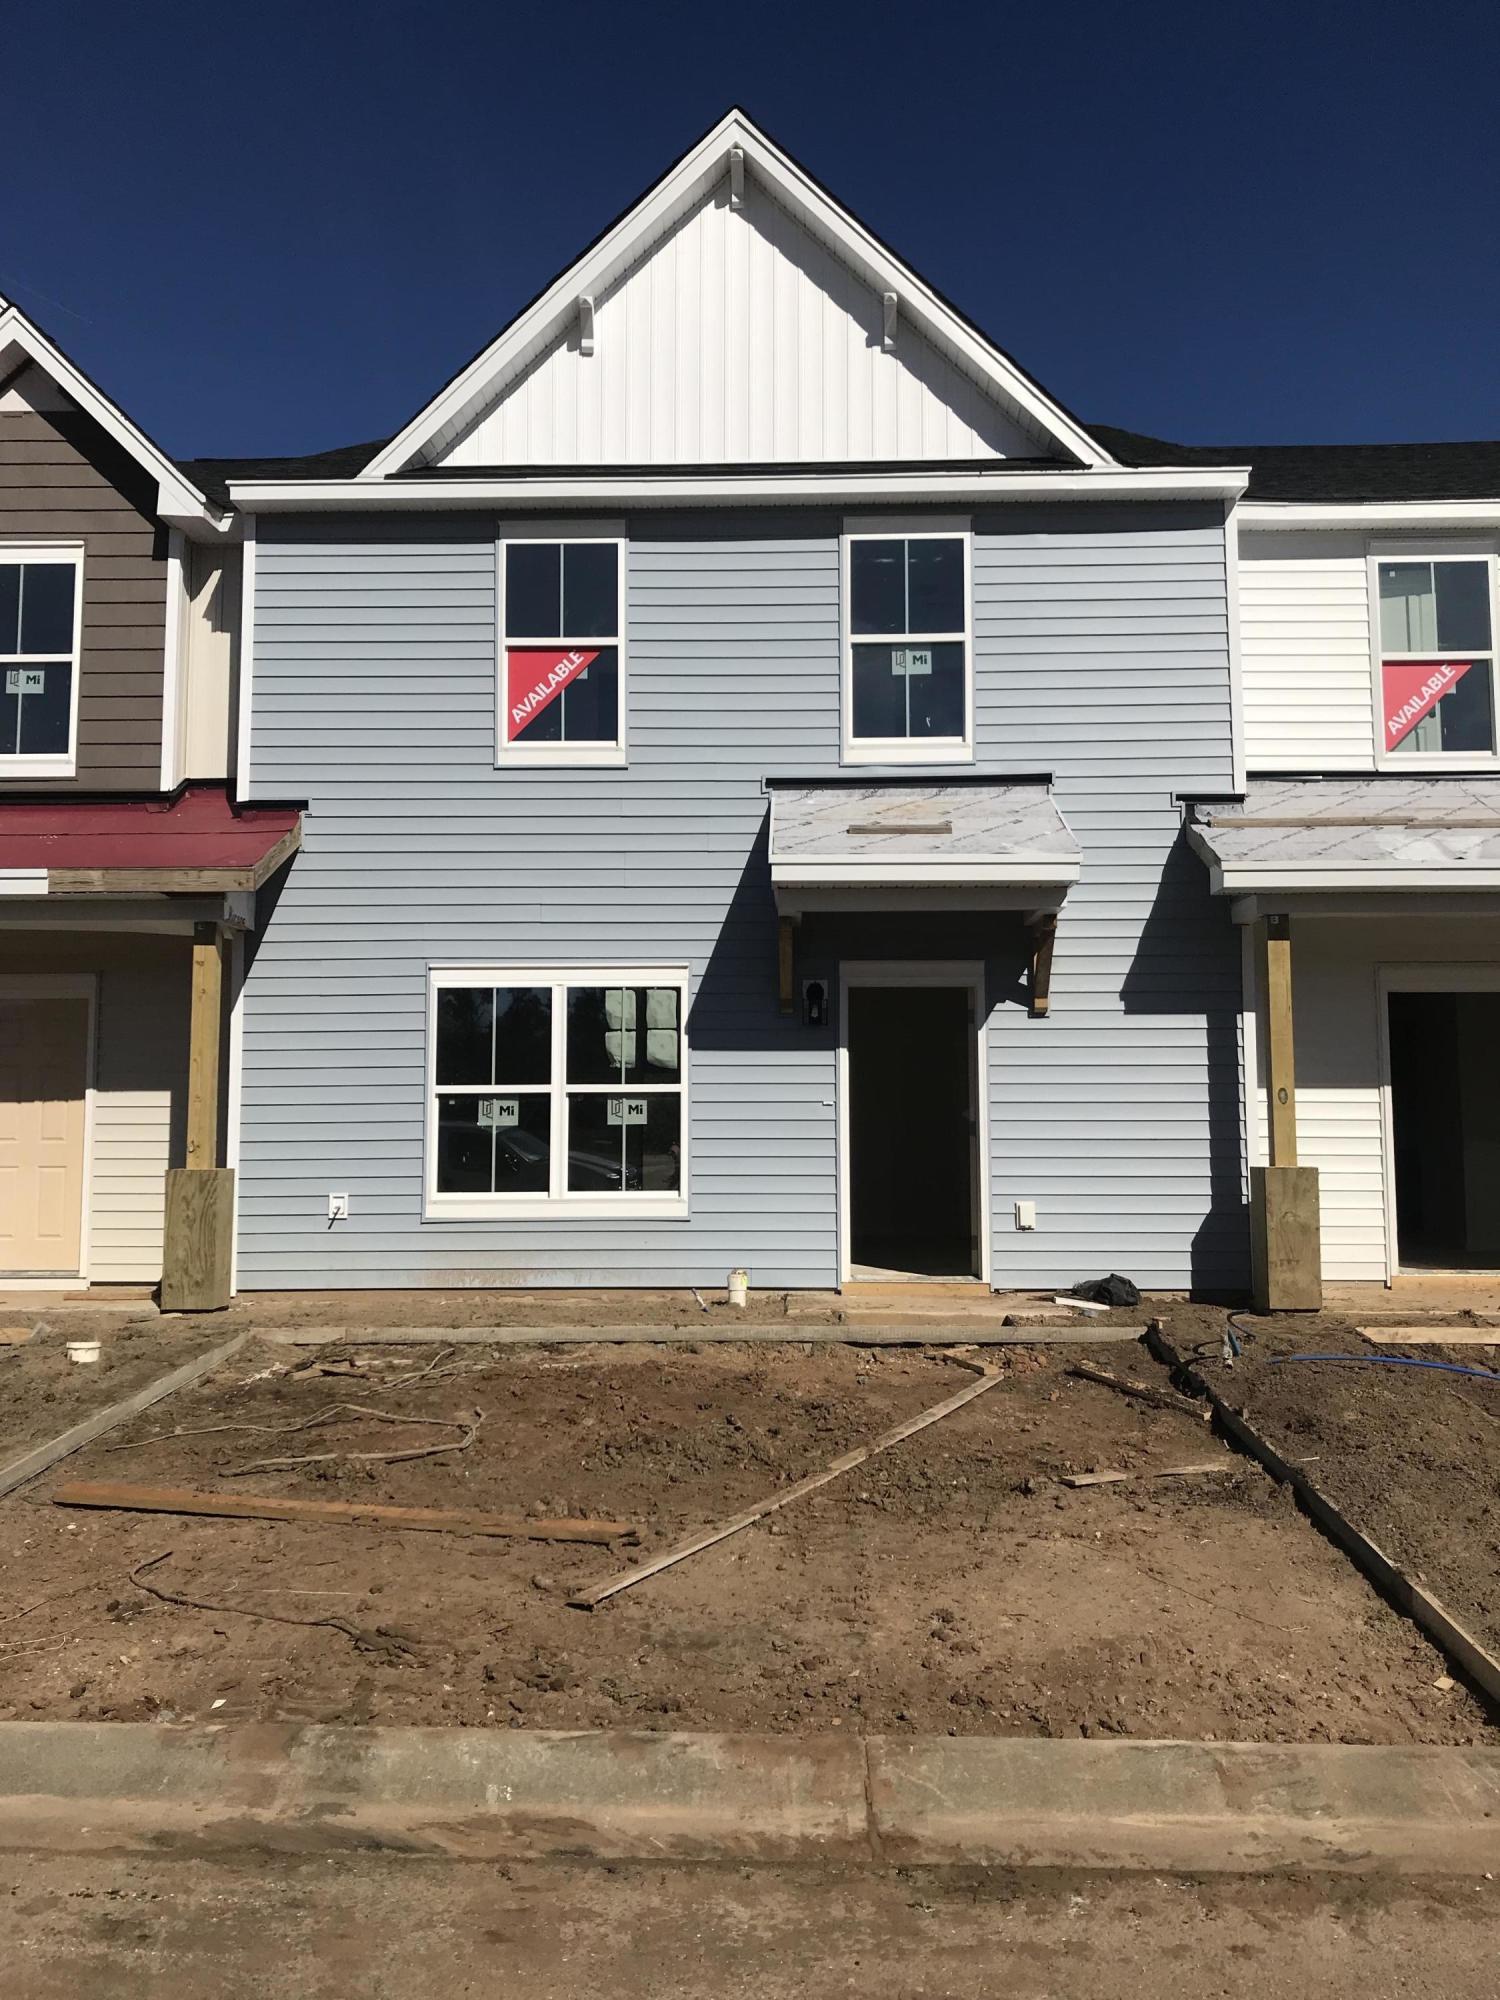 Montague Plantation Homes For Sale - 436 Viceroy, Goose Creek, SC - 20